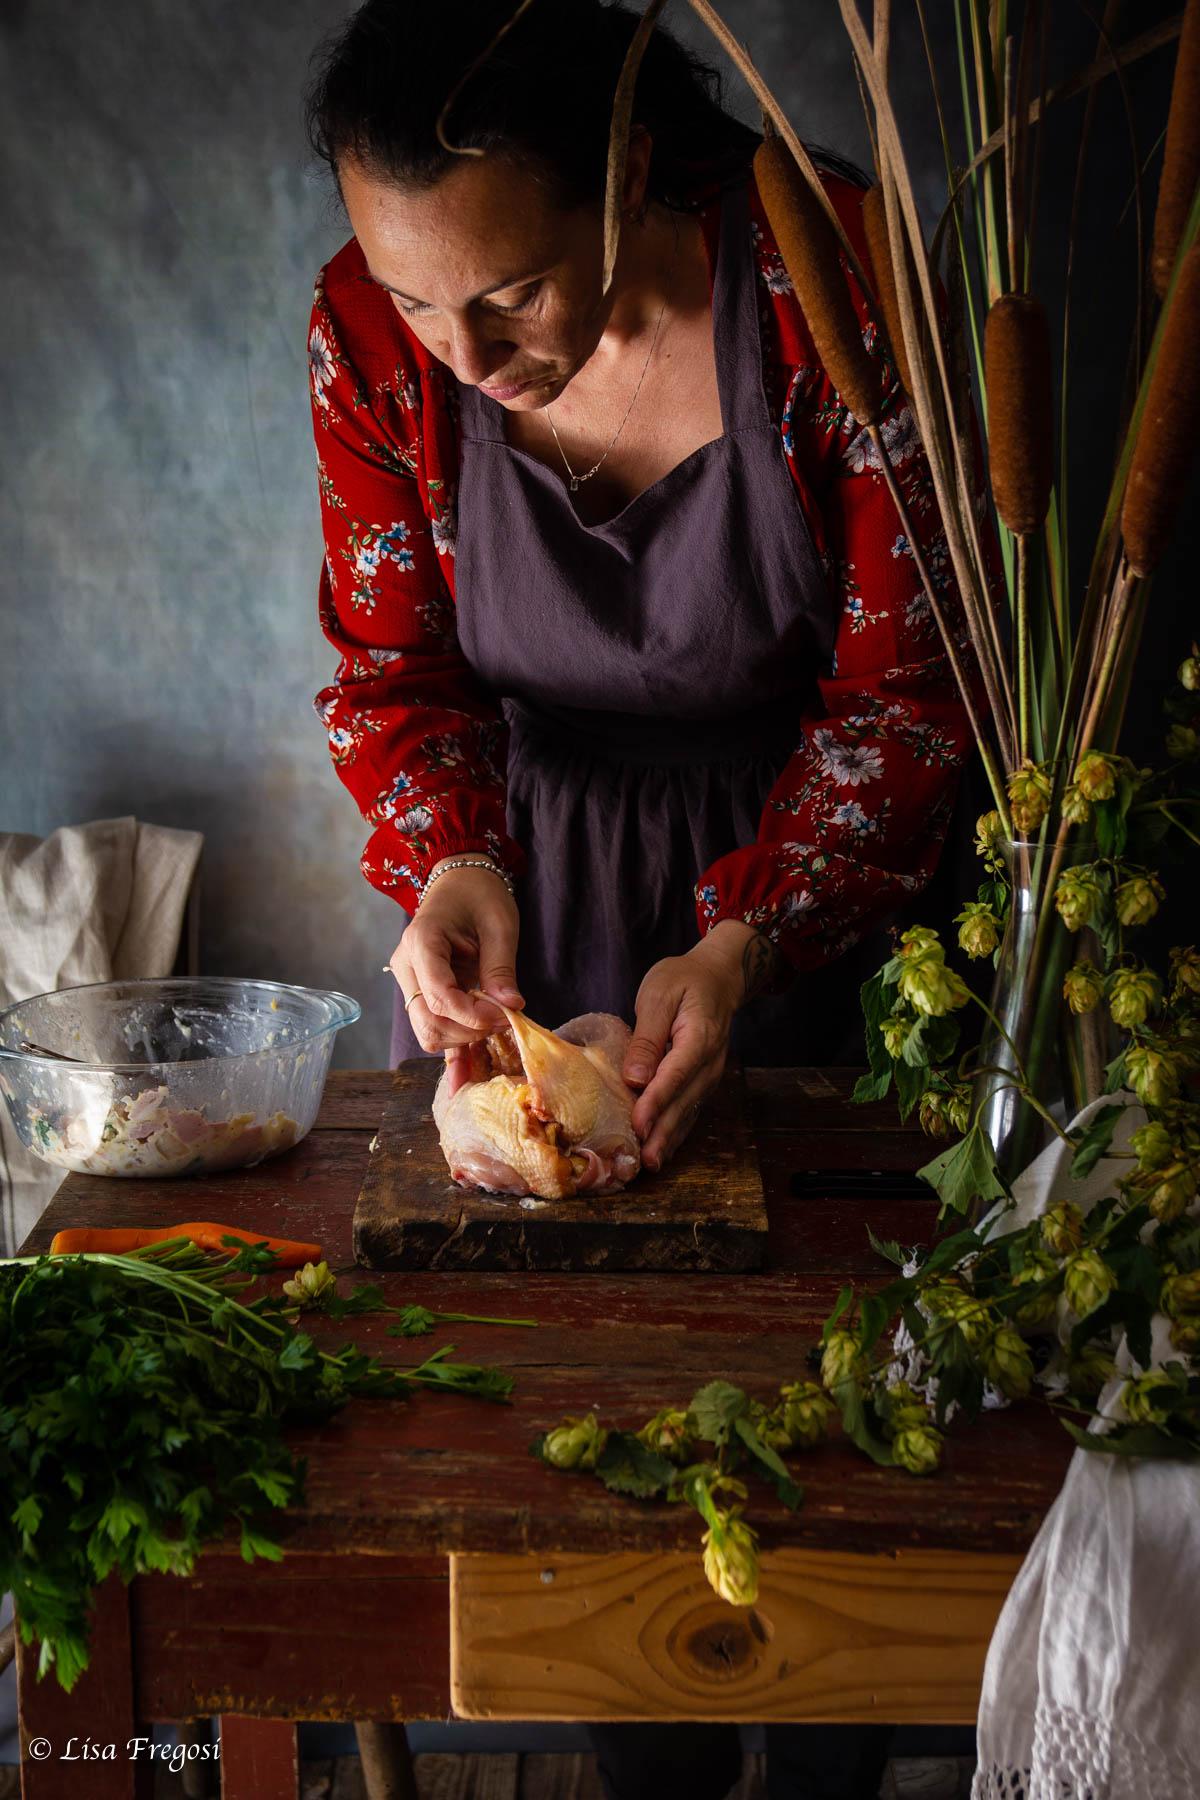 gallina ripiena gallina ripiena arrosto gallina ripiena in brodo gallina ripiena alla veneta gallina ripiena in brodo tempo di cottura gallina con ripieno cottura gallina ripiena